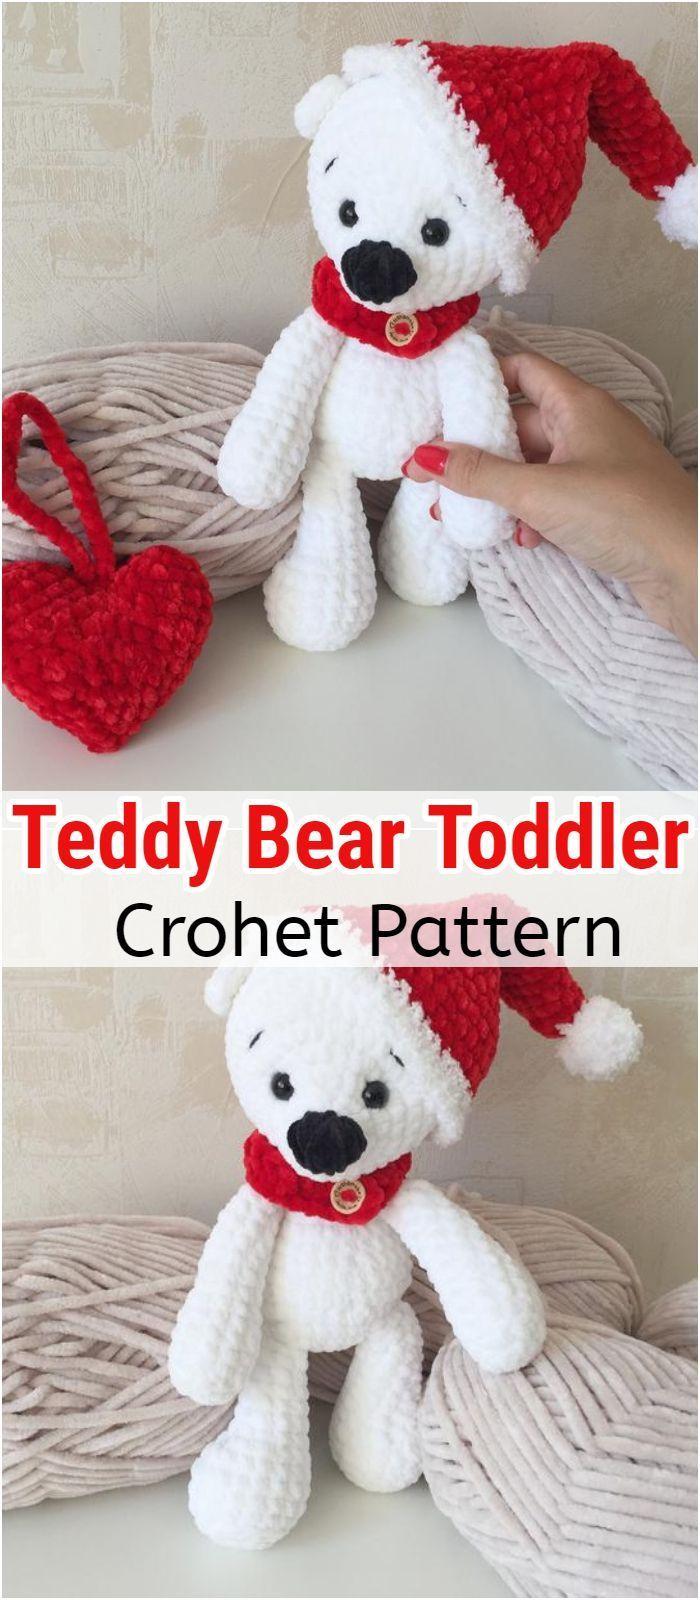 Free Crochet Bear Patterns – Amigurumi Patterns #teddybearpatterns Free Crochet Bear Patterns – Amigurumi Patterns #crochetteddybears